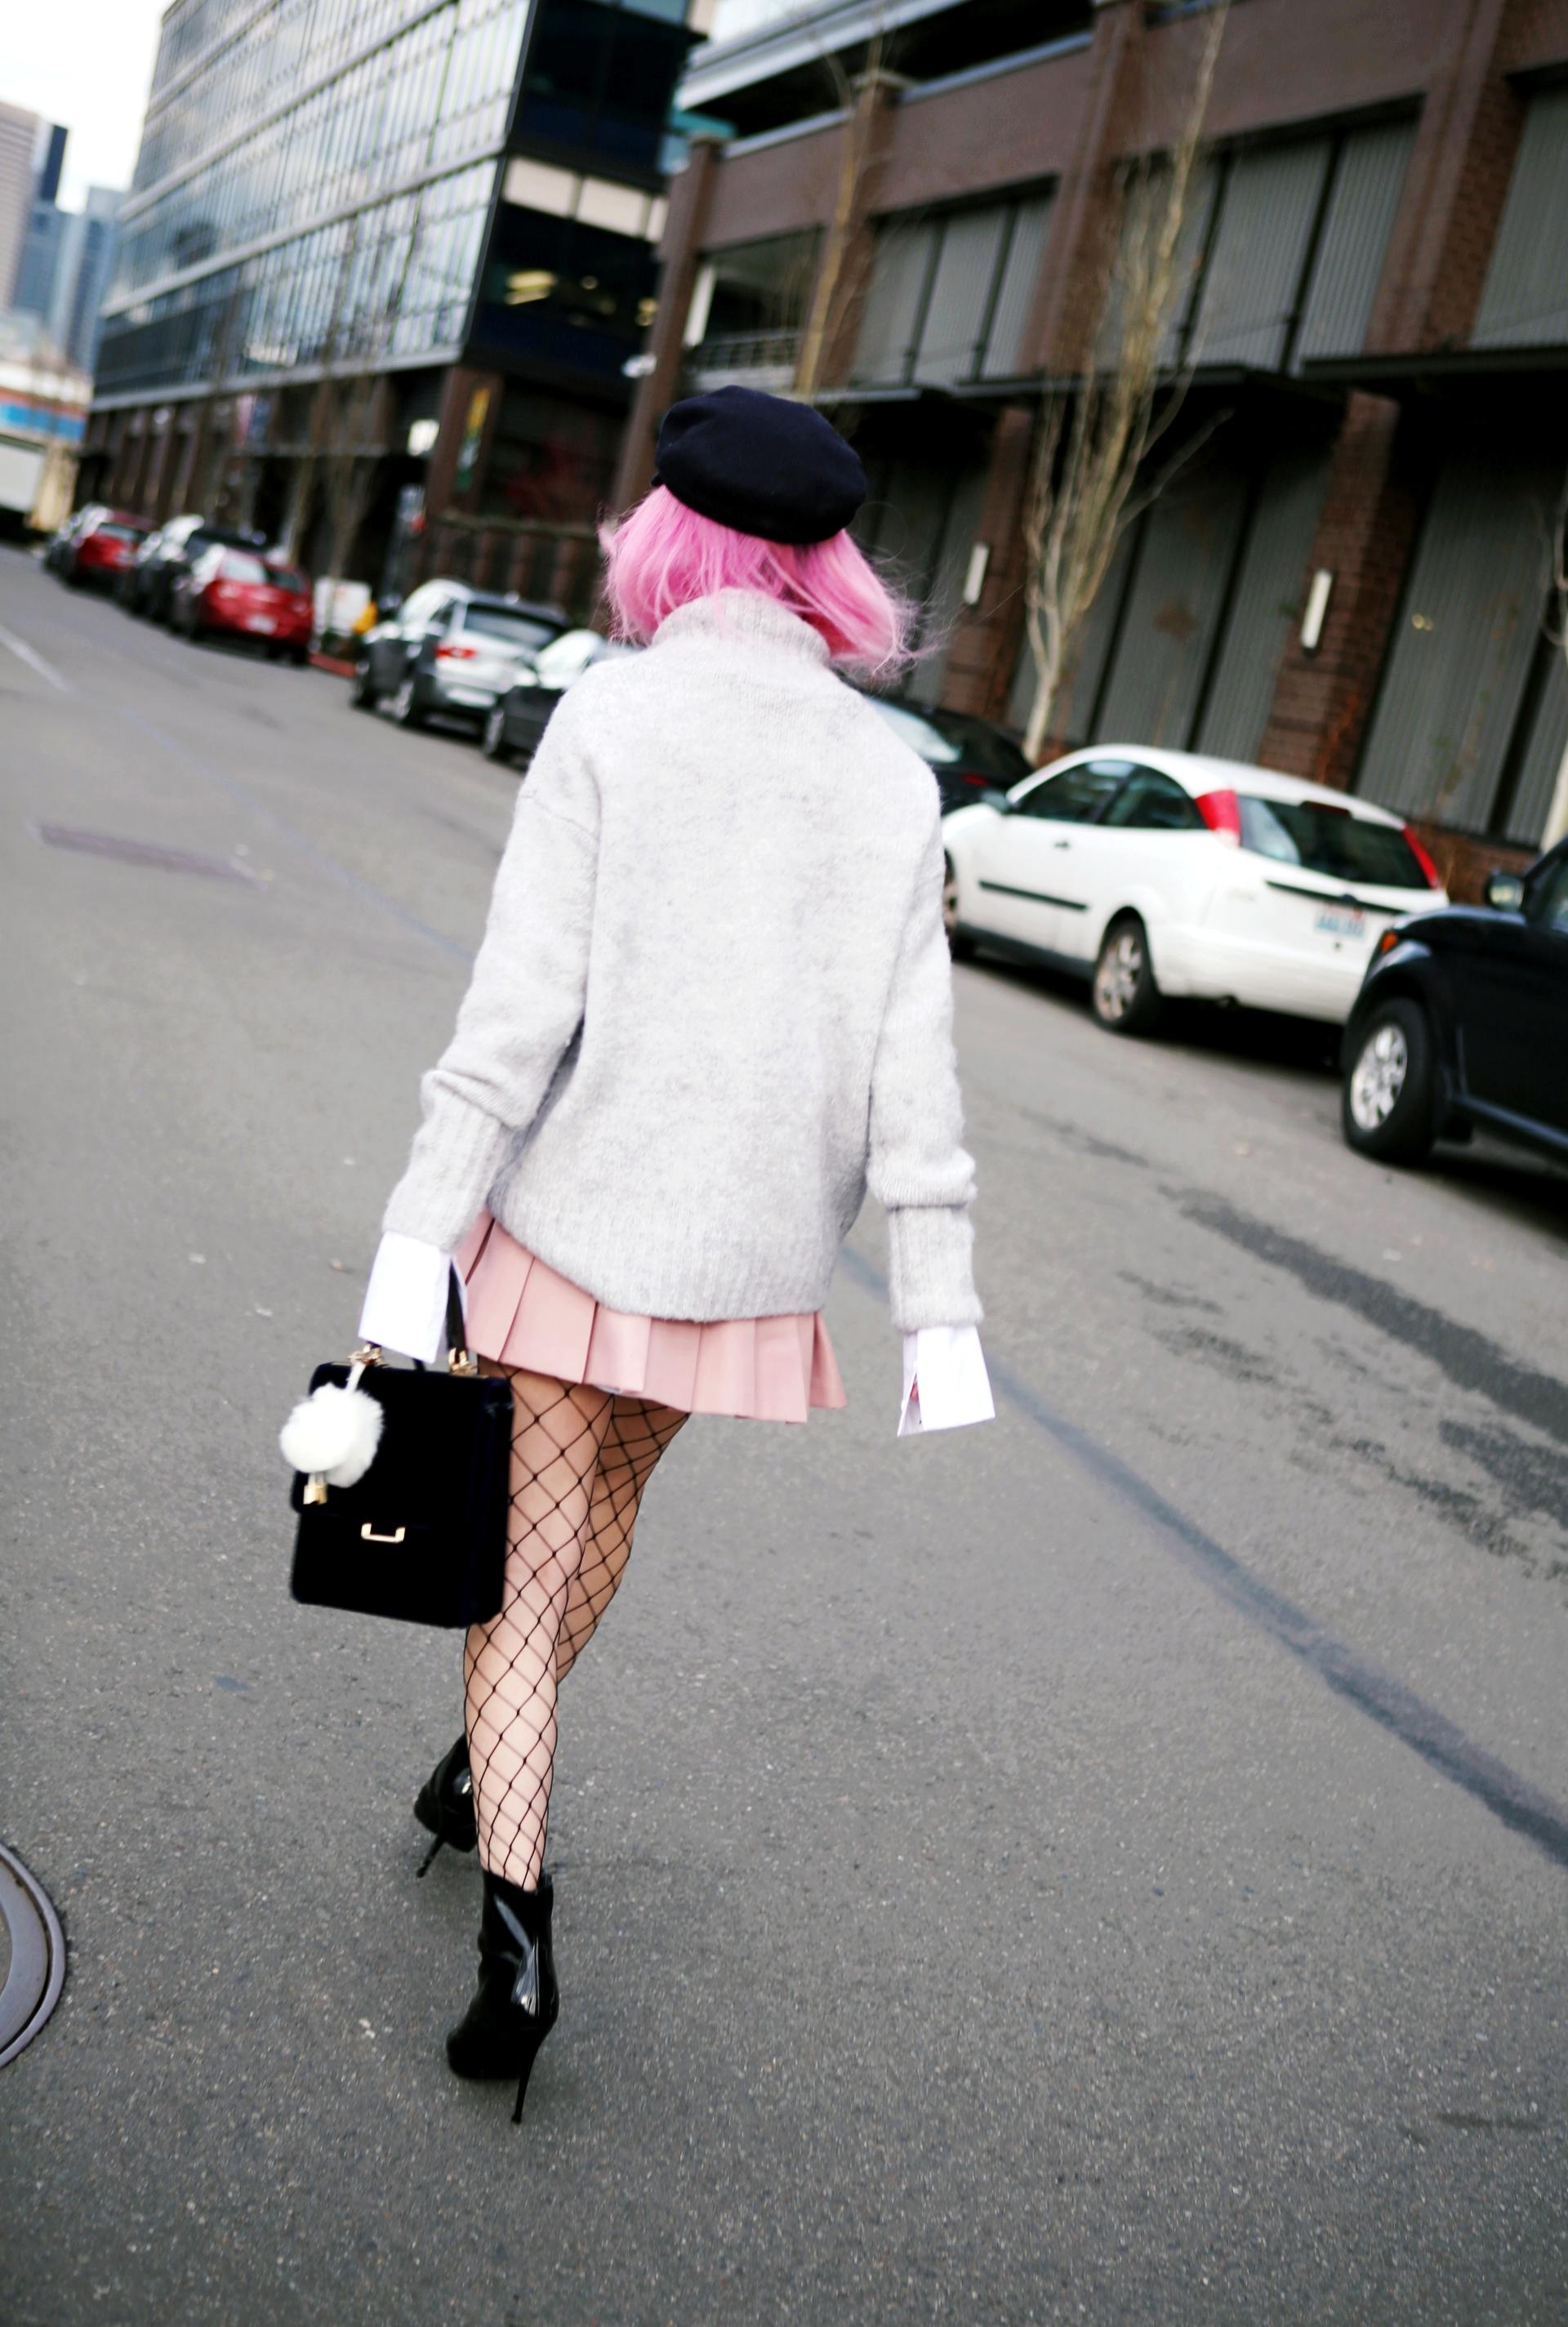 Isabel Marant News Boy Hat-H&M Gray Turtleneck Sweater-H&M Wide cuff Cotton Shirt-Forever 21 Pleated Mini Skirt-Boohoo Wide Fishnet Tights-ZARA Velvet Bag-ALDO Patent Booties-Le Specs Air Heart Sunglasses-Milani Black Cherry Lipstick-Aikas Love Closet-Seattle Style Lifestyle Blogger-japanese-pink hair 16